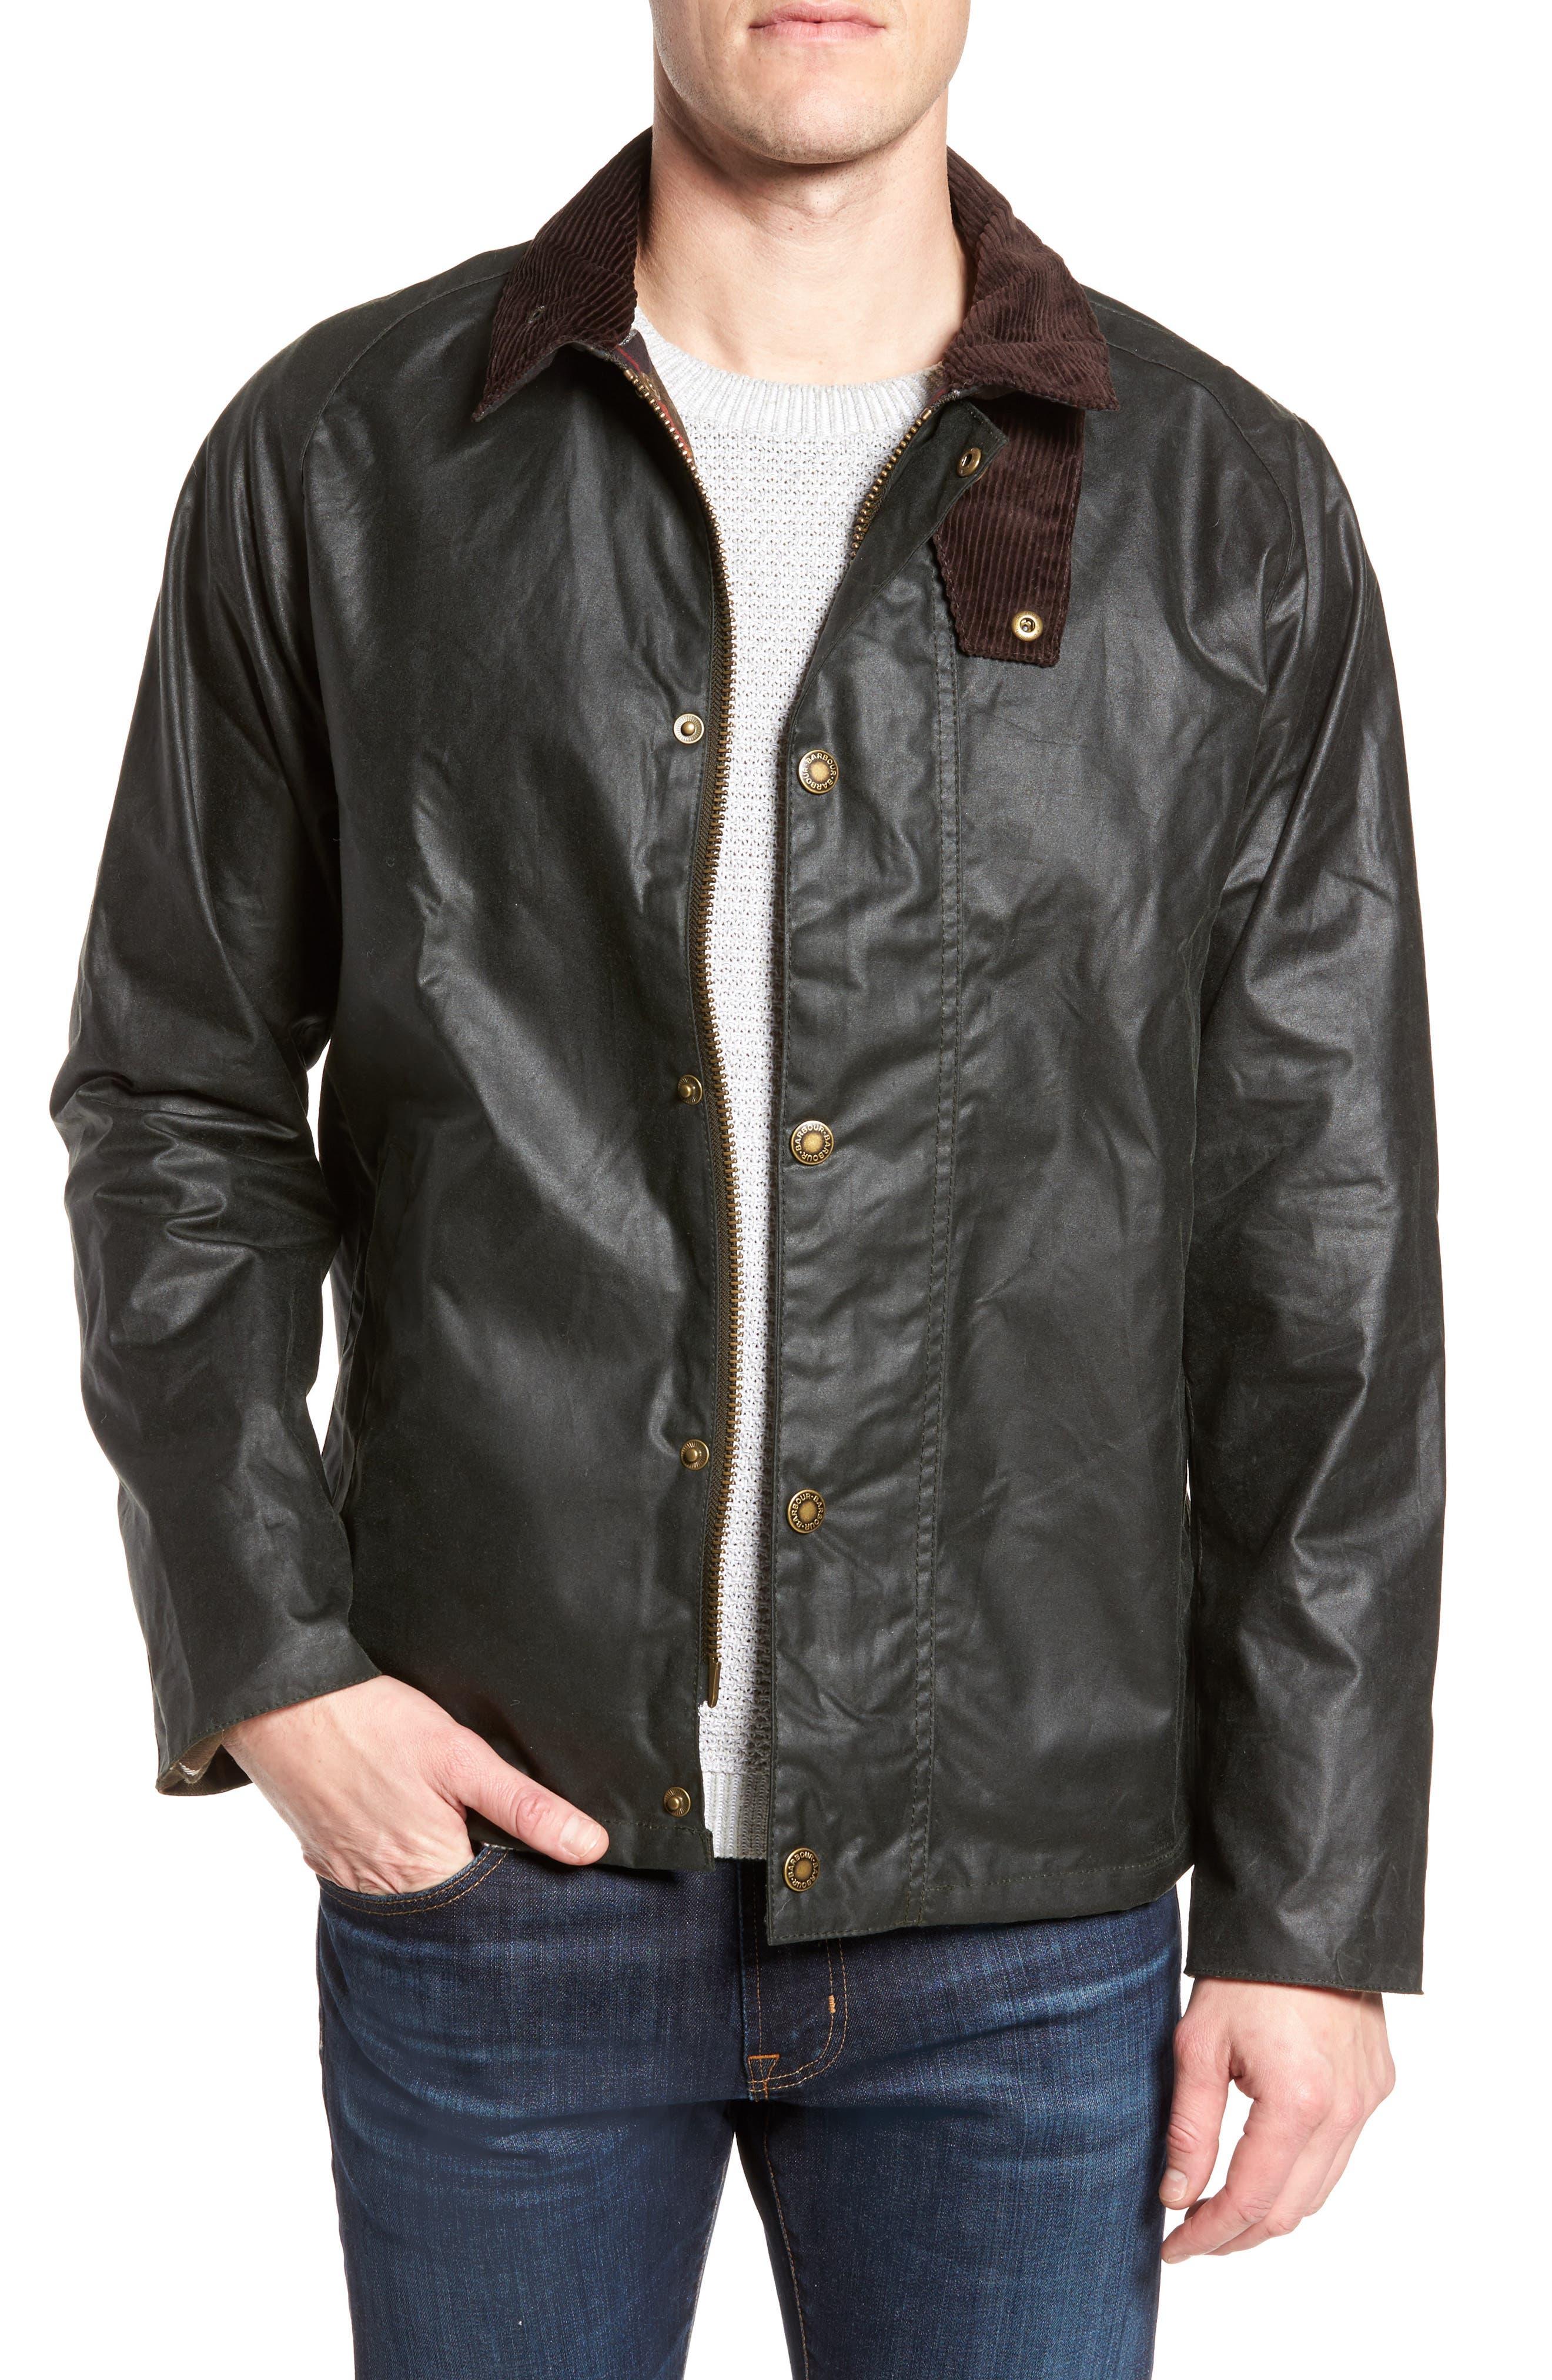 Heskin Waxed Cotton Jacket,                             Main thumbnail 1, color,                             SAGE